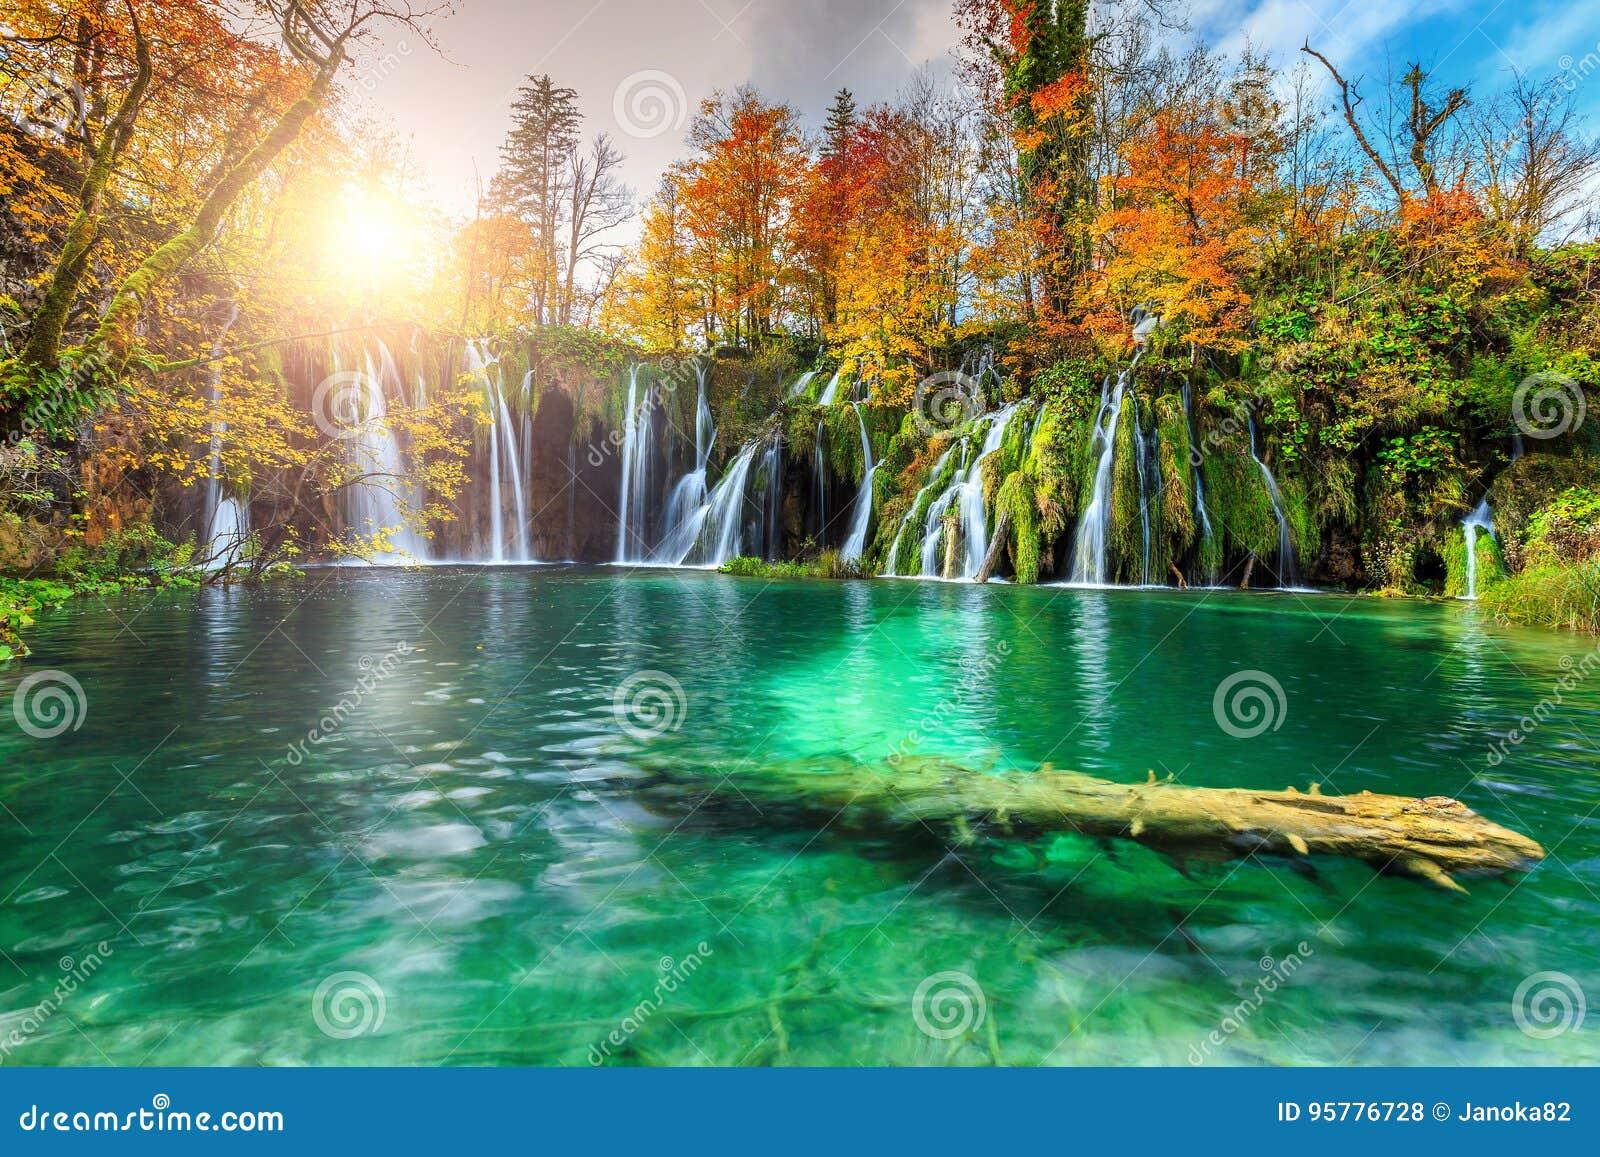 Bunte aututmn Landschaft mit Wasserfällen in Nationalpark Plitvice, Kroatien